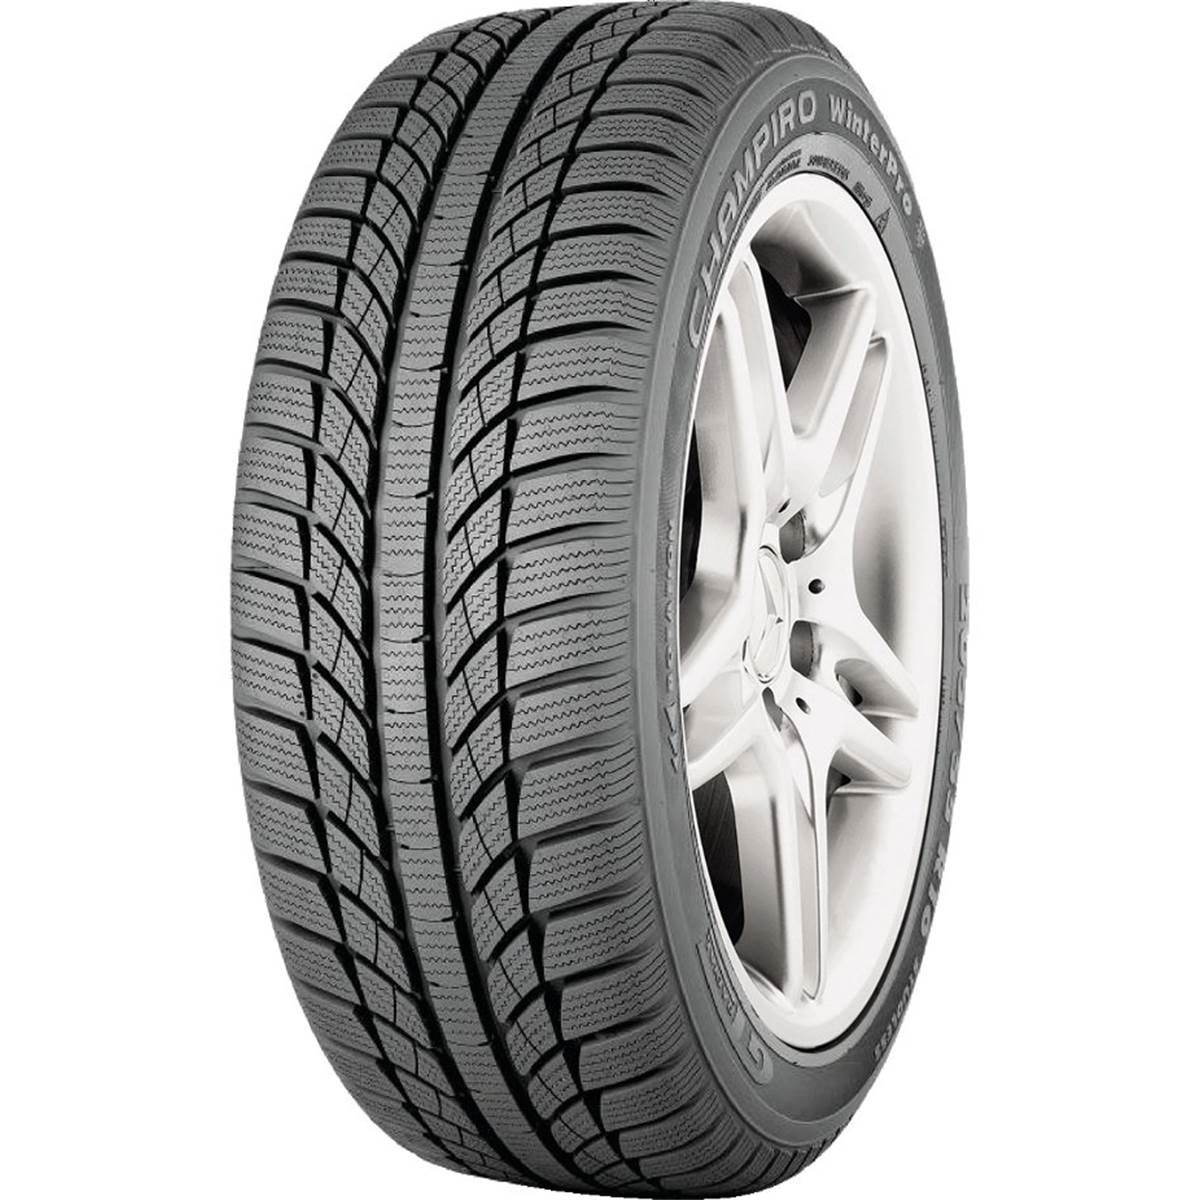 pneus radial achat vente de pneus pas cher. Black Bedroom Furniture Sets. Home Design Ideas